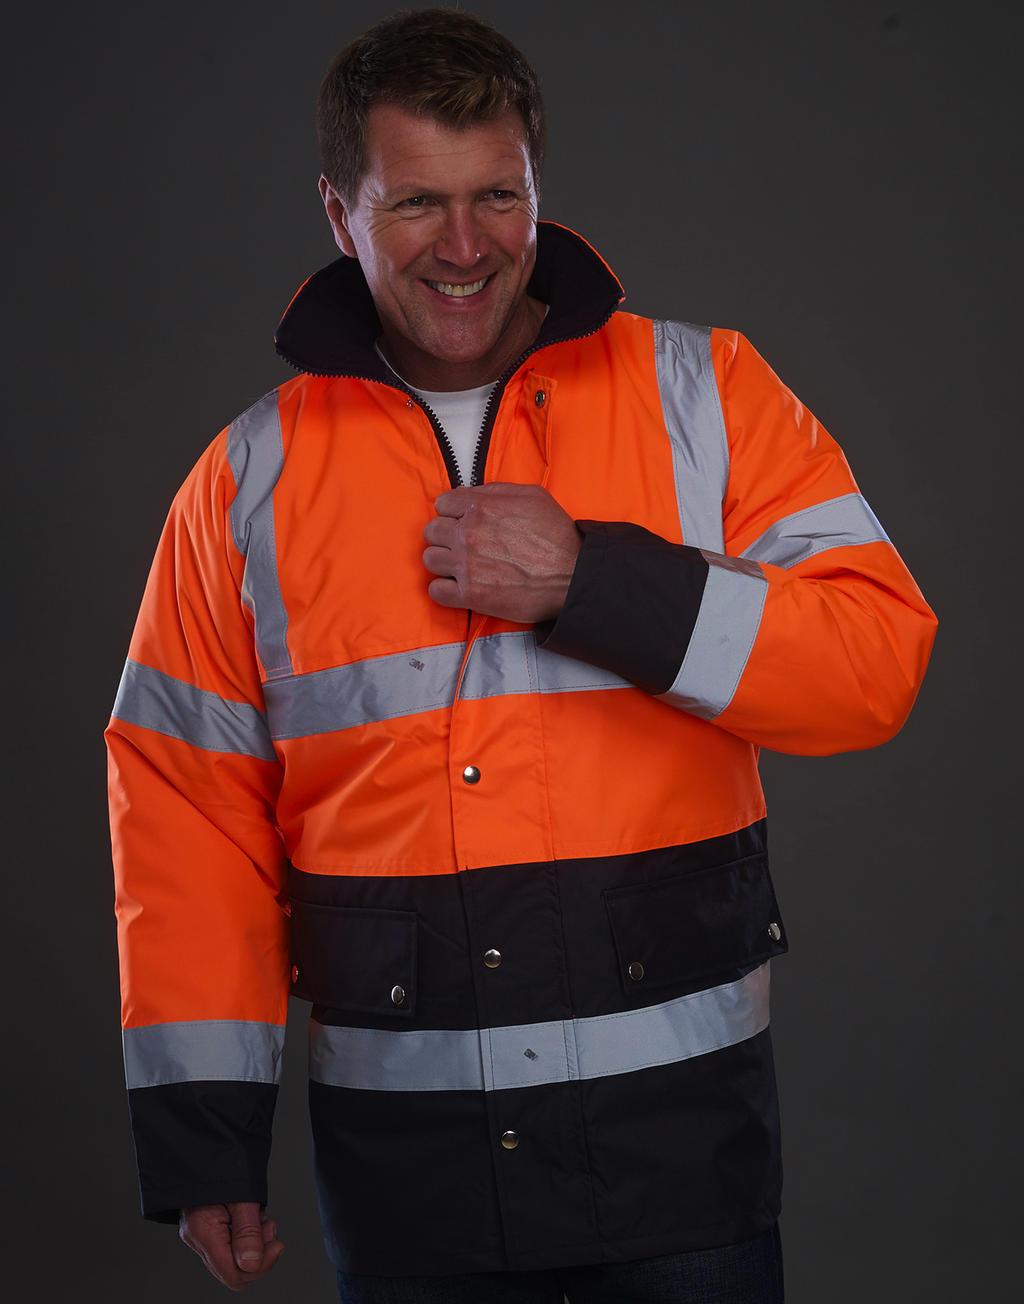 Dvoubarevná bunda Fluo Motorway - zvìtšit obrázek